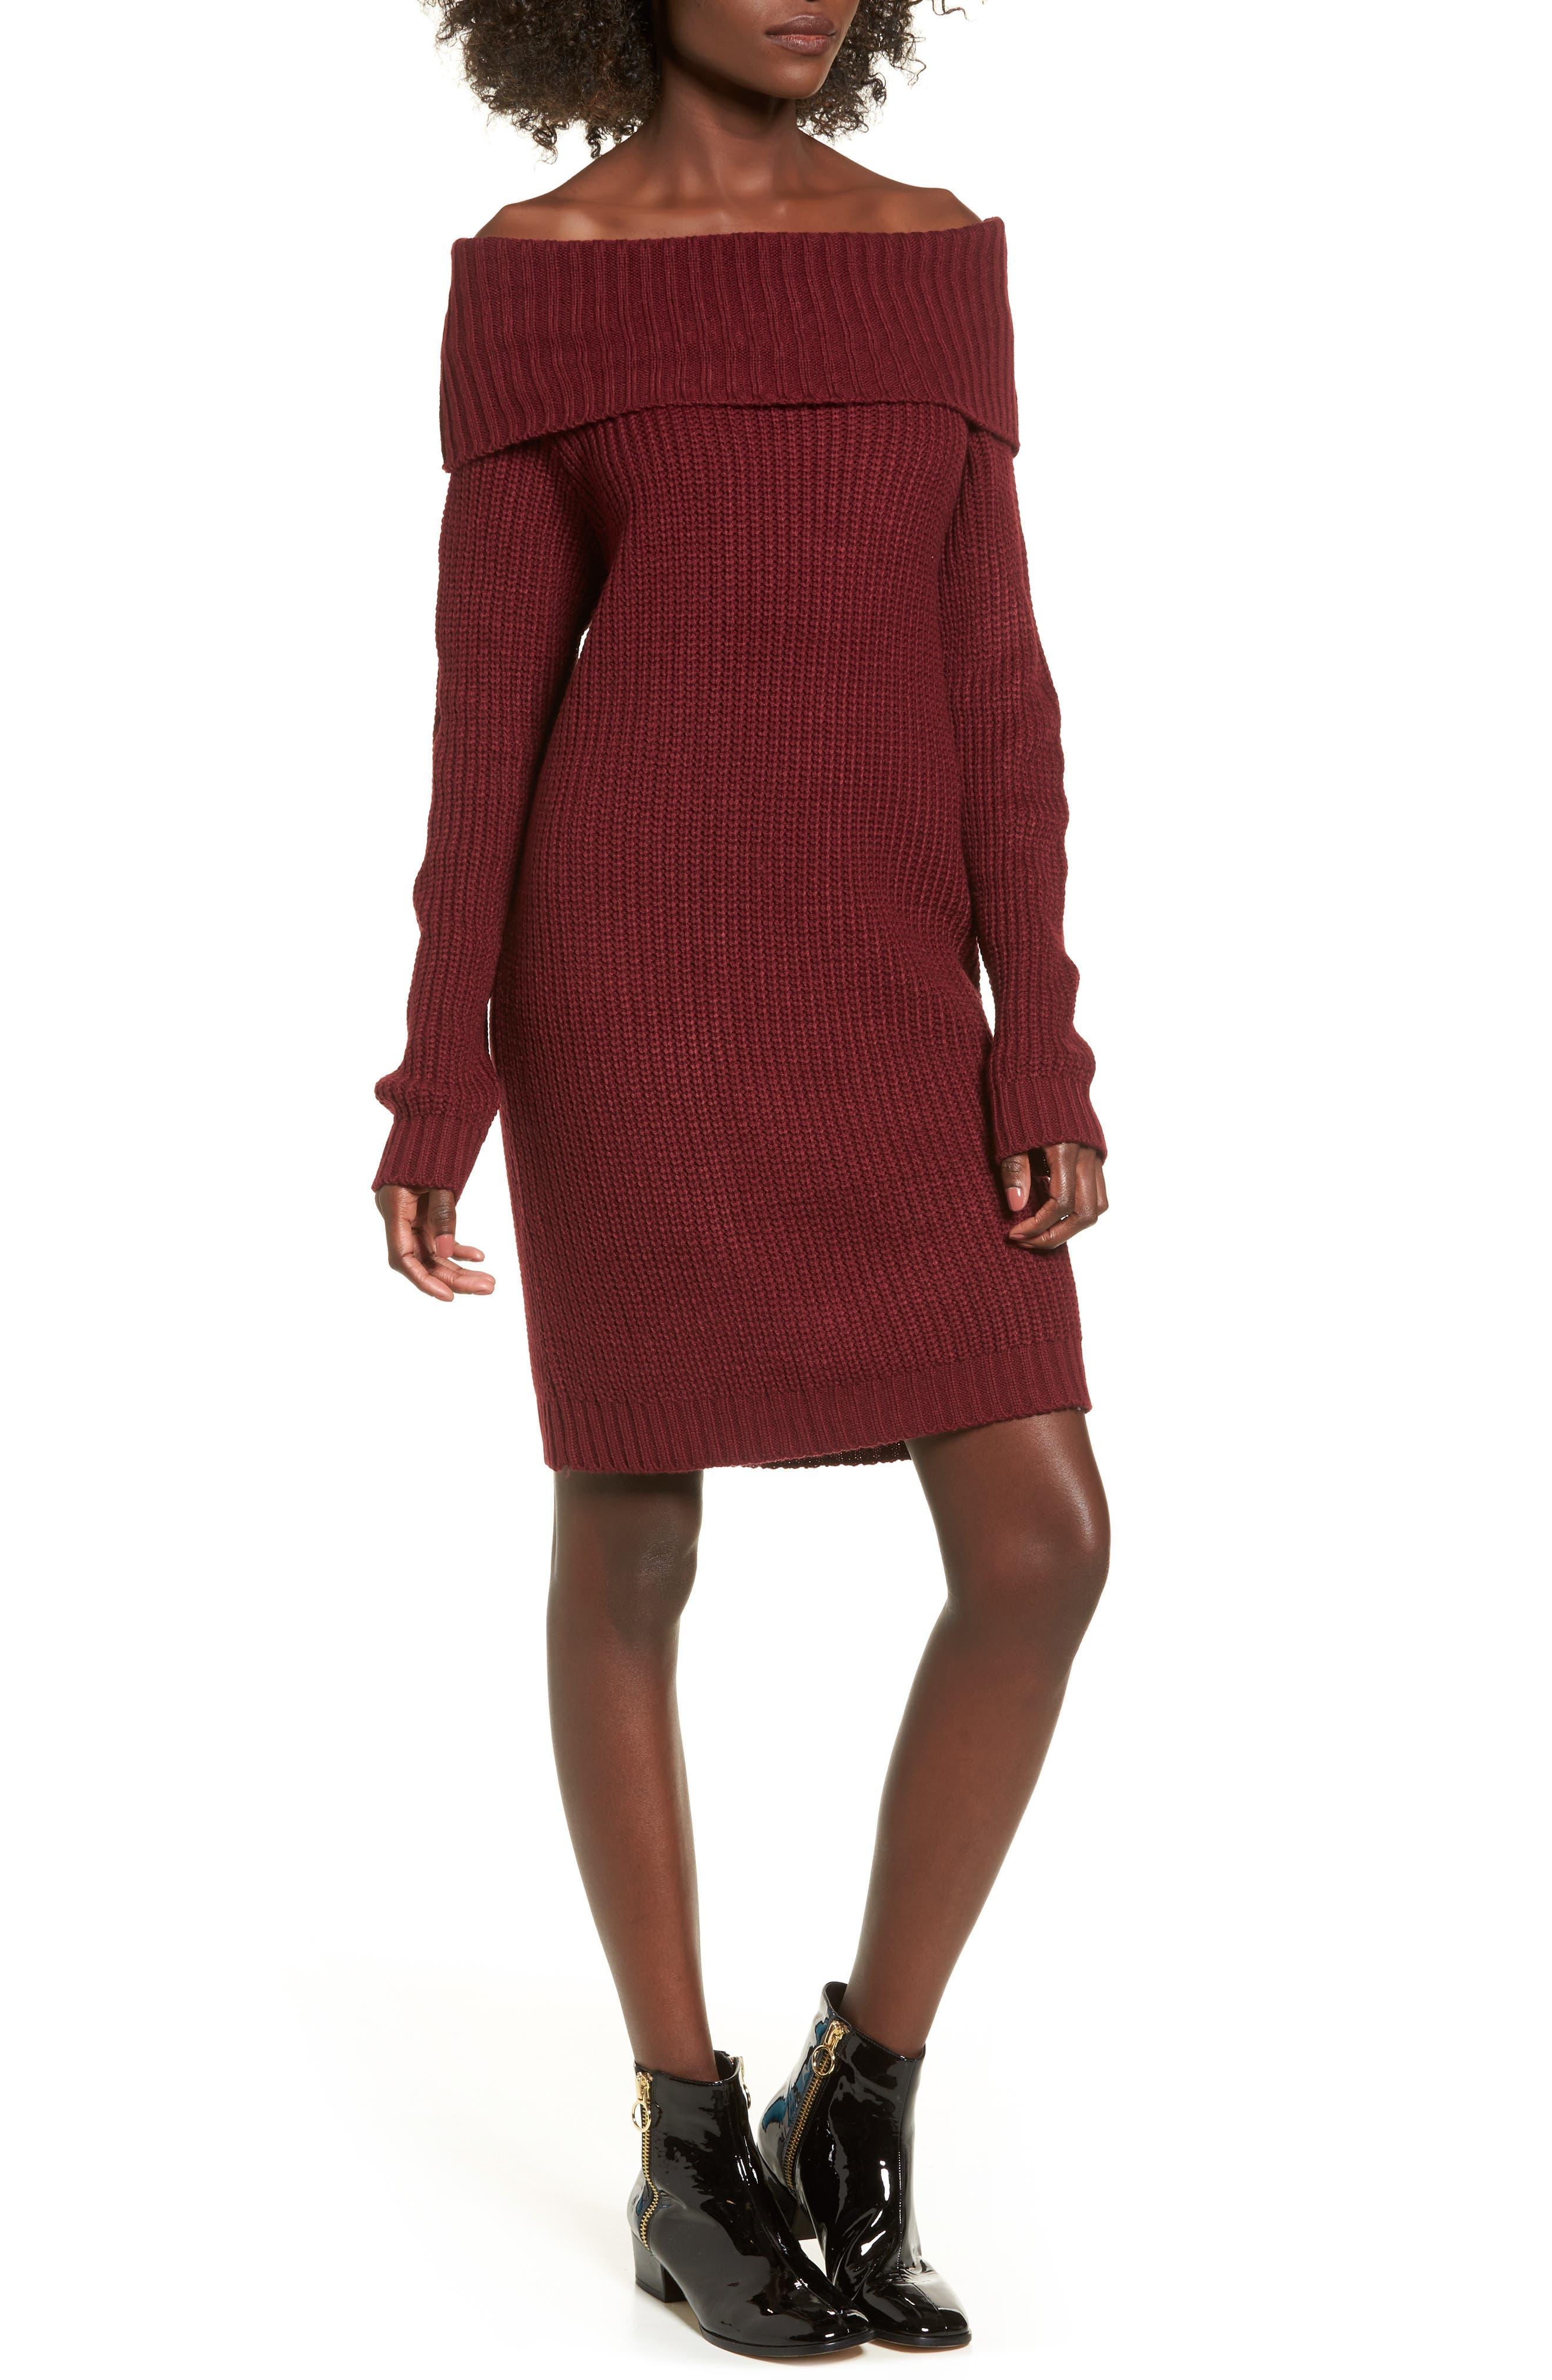 Cotton Emporium Foldover Off the Shoulder Sweater Dress